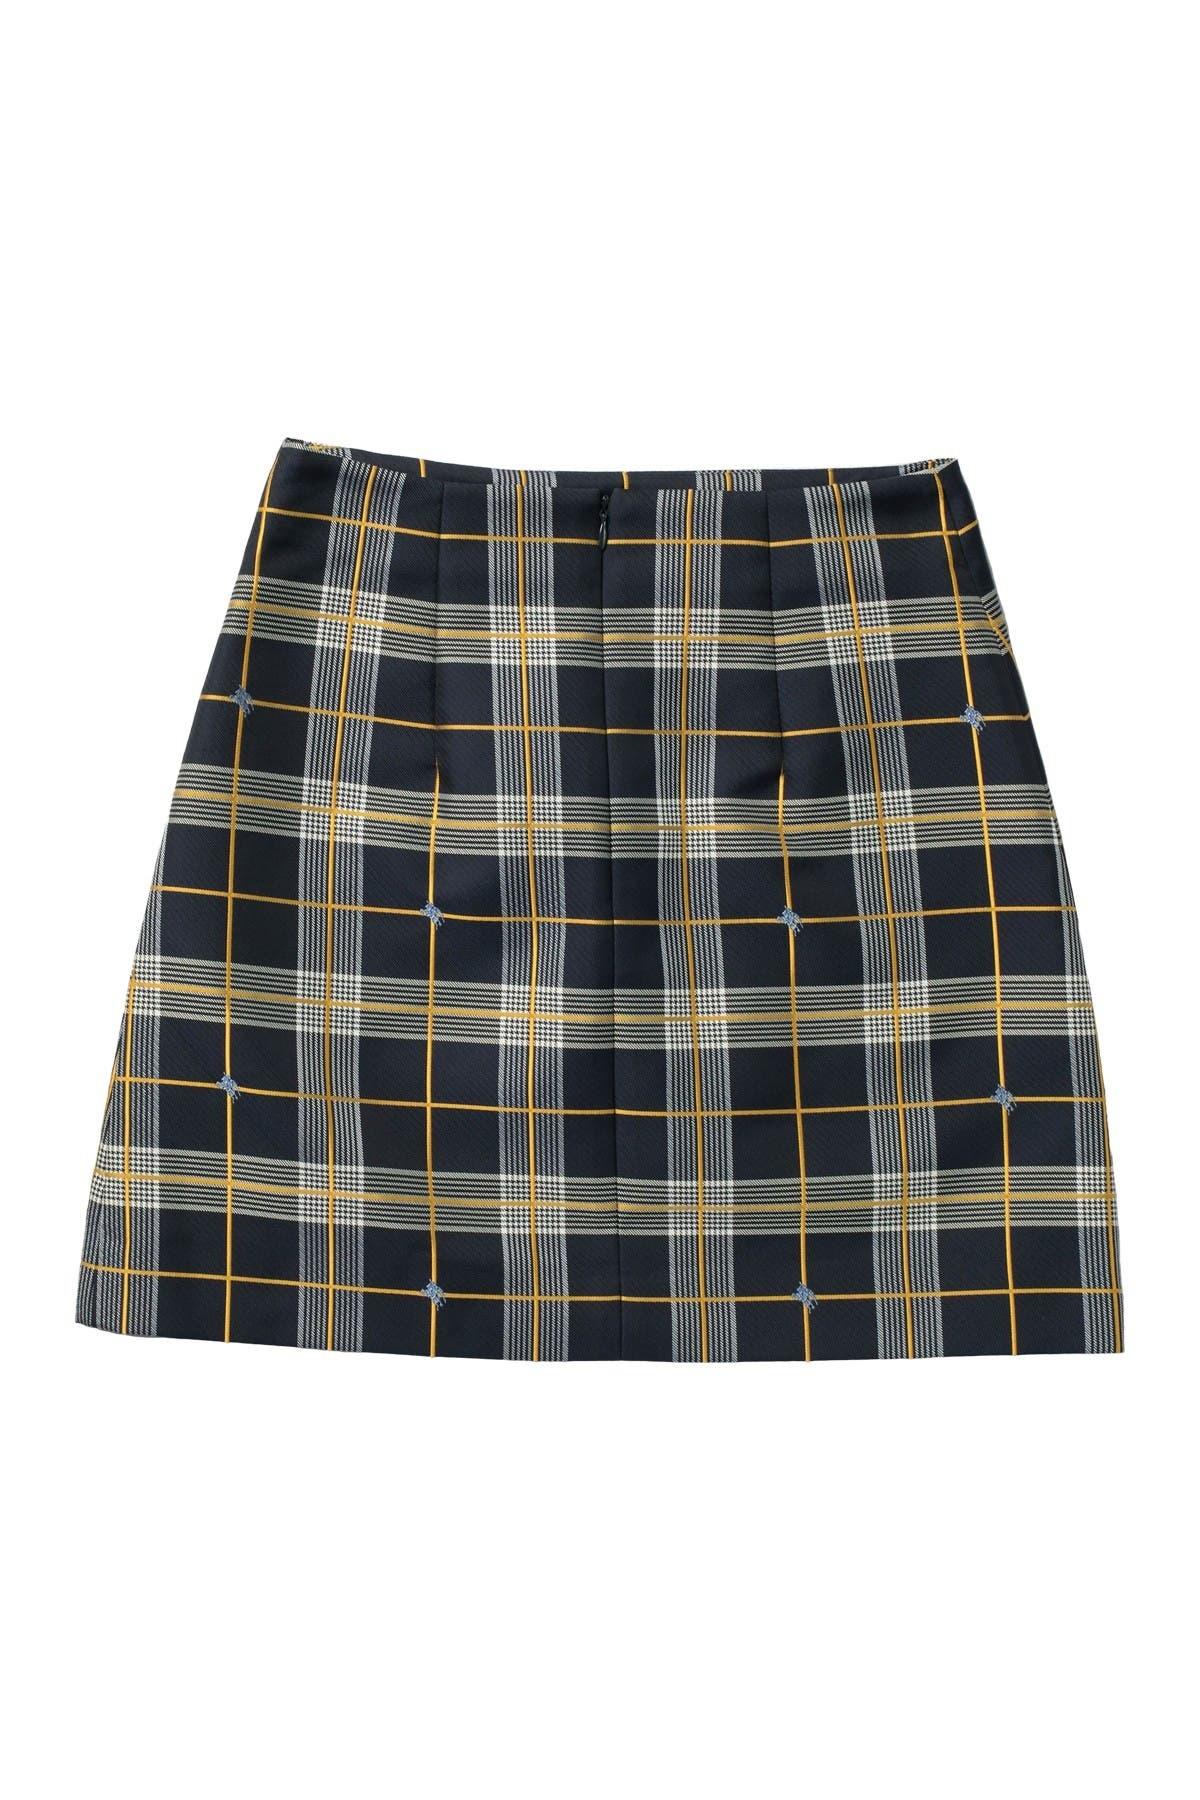 Burberry Ladies Navy Check Mini Skirt In Blue